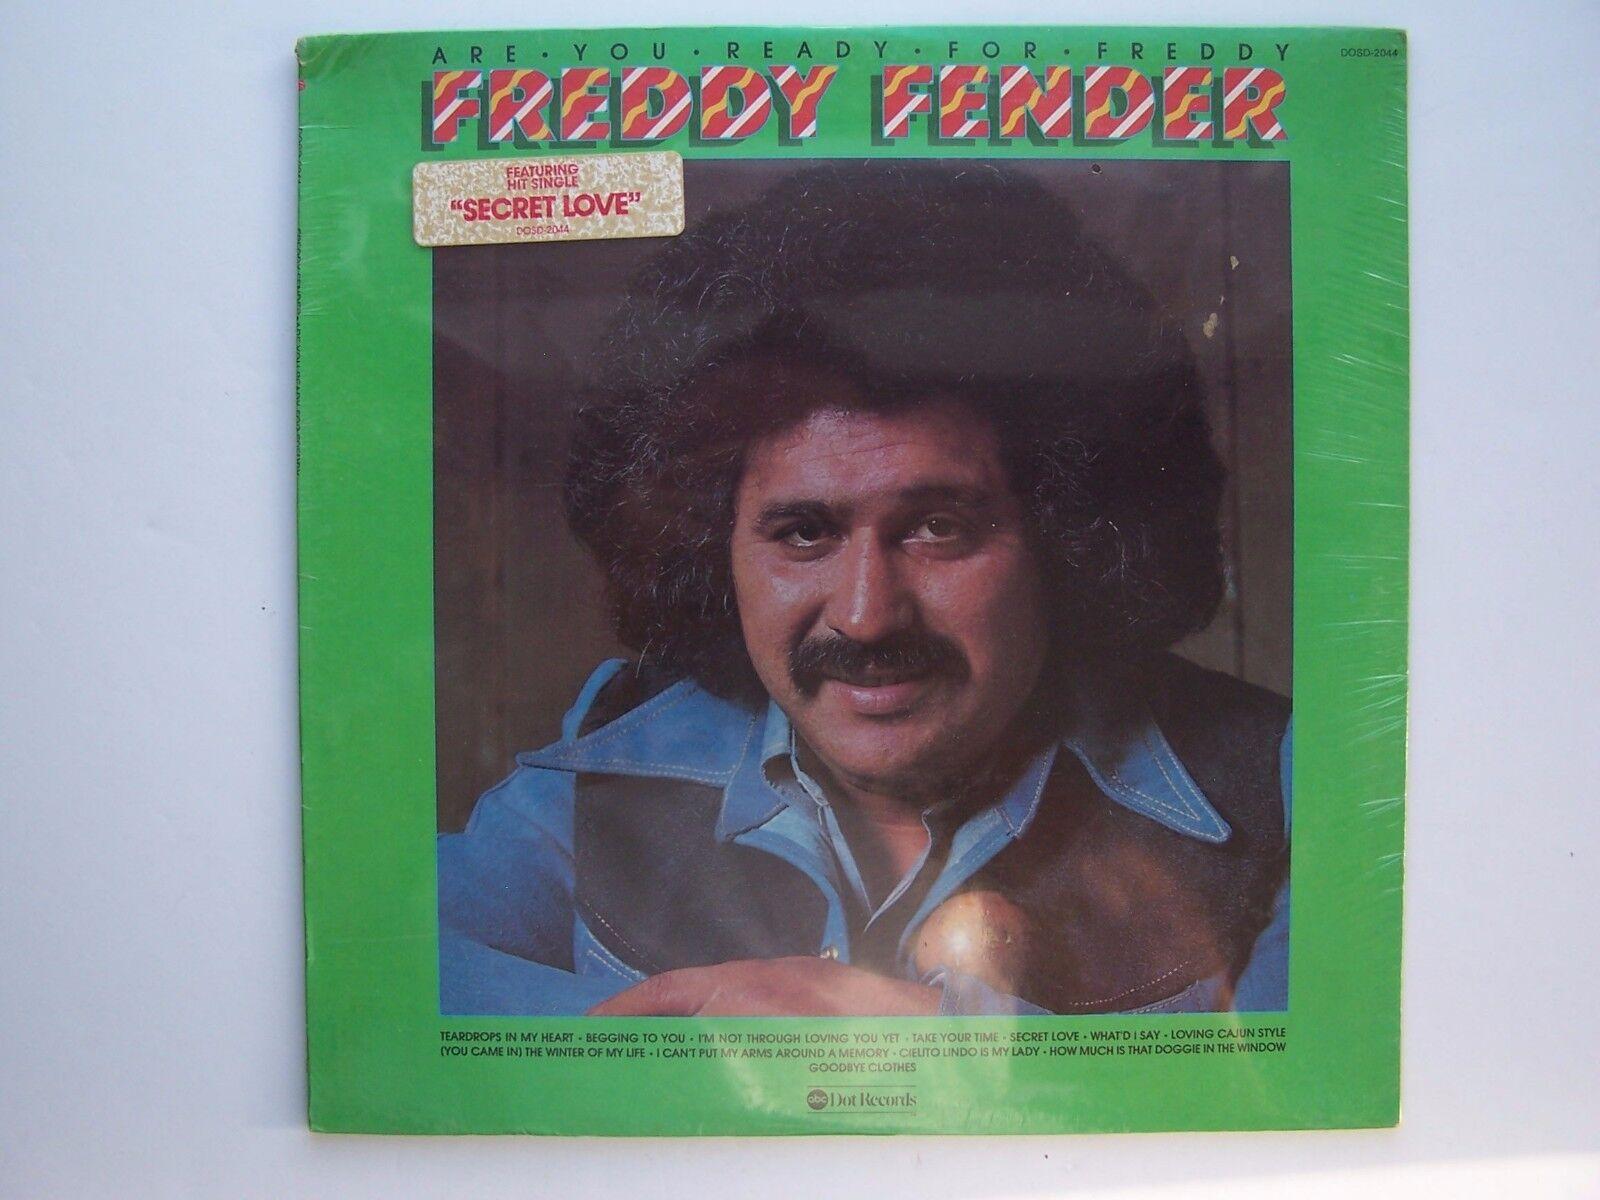 Freddy Fender - Are You Ready For Freddy Vinyl LP Recor